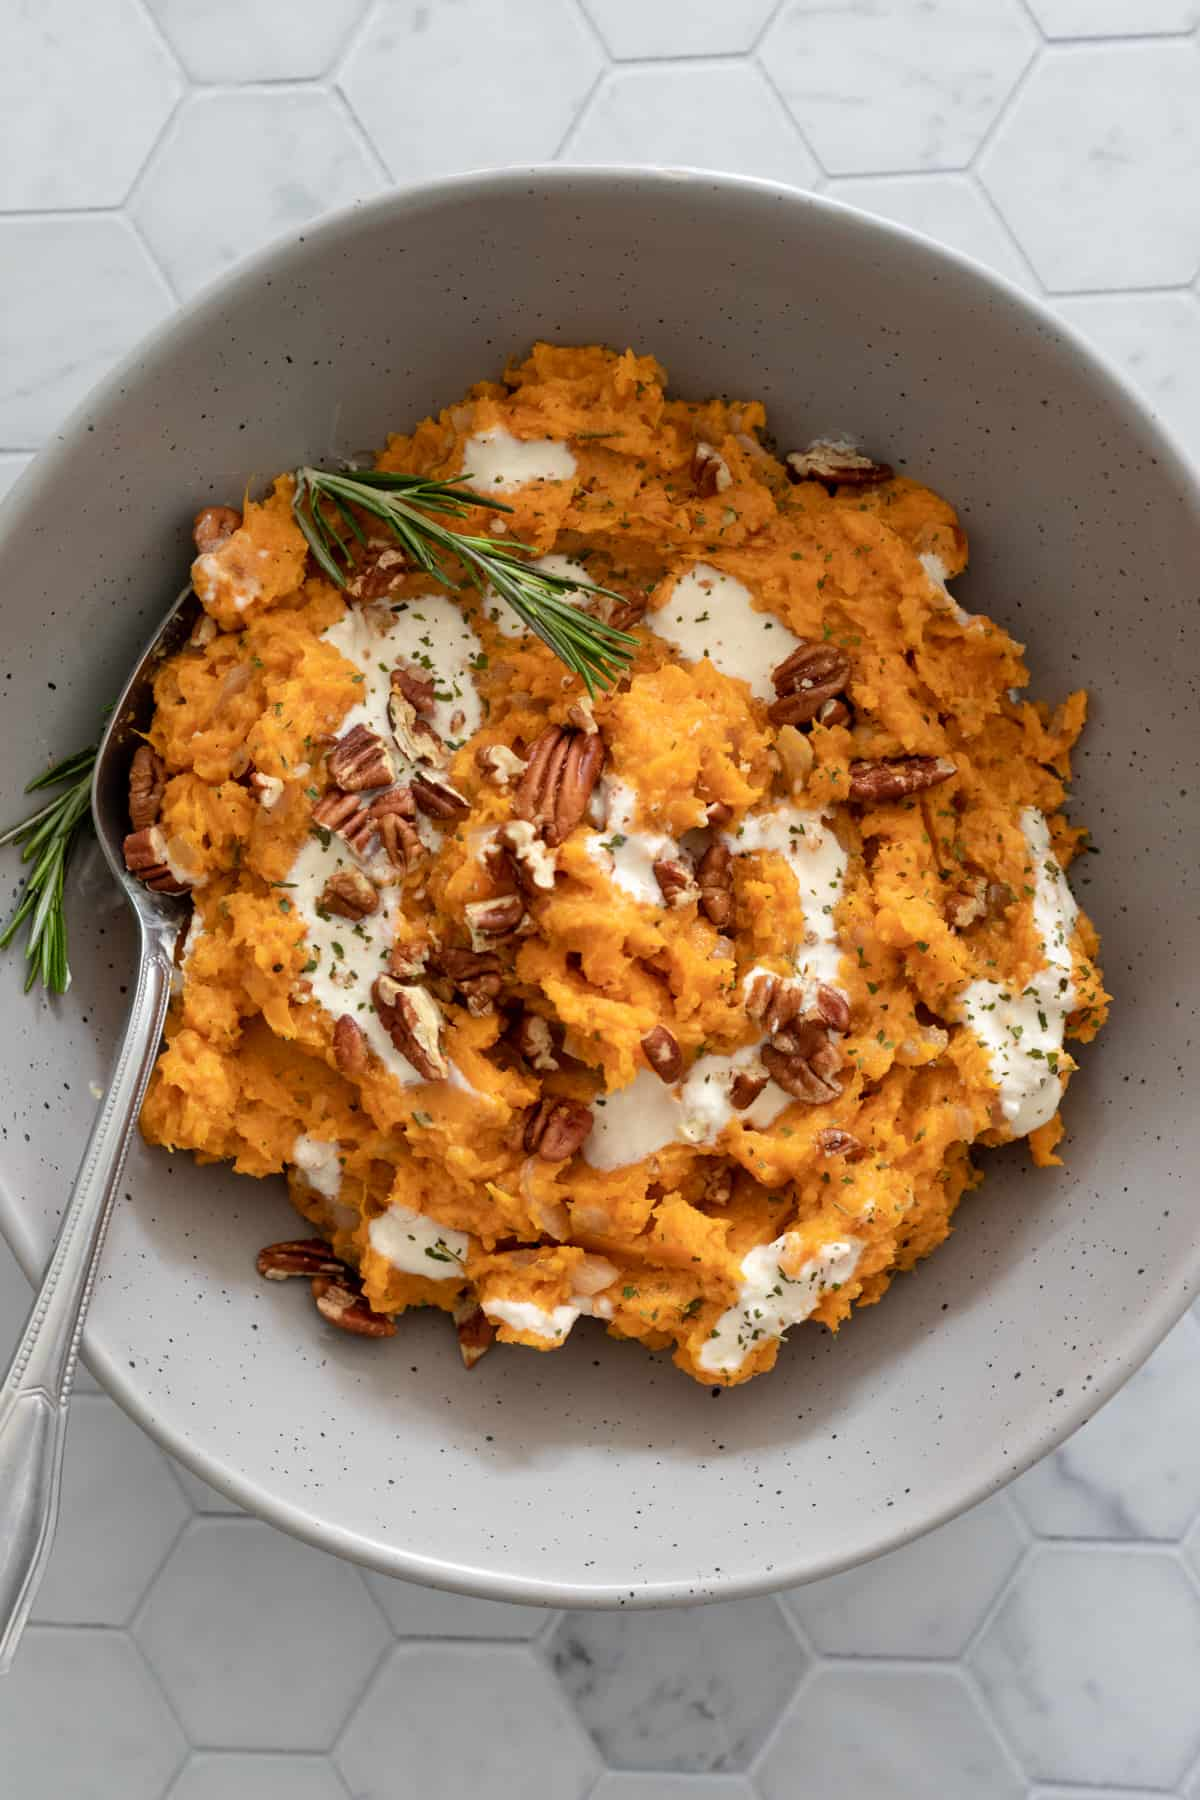 colorful sweet potato mash in a bowl swirled with yogurt